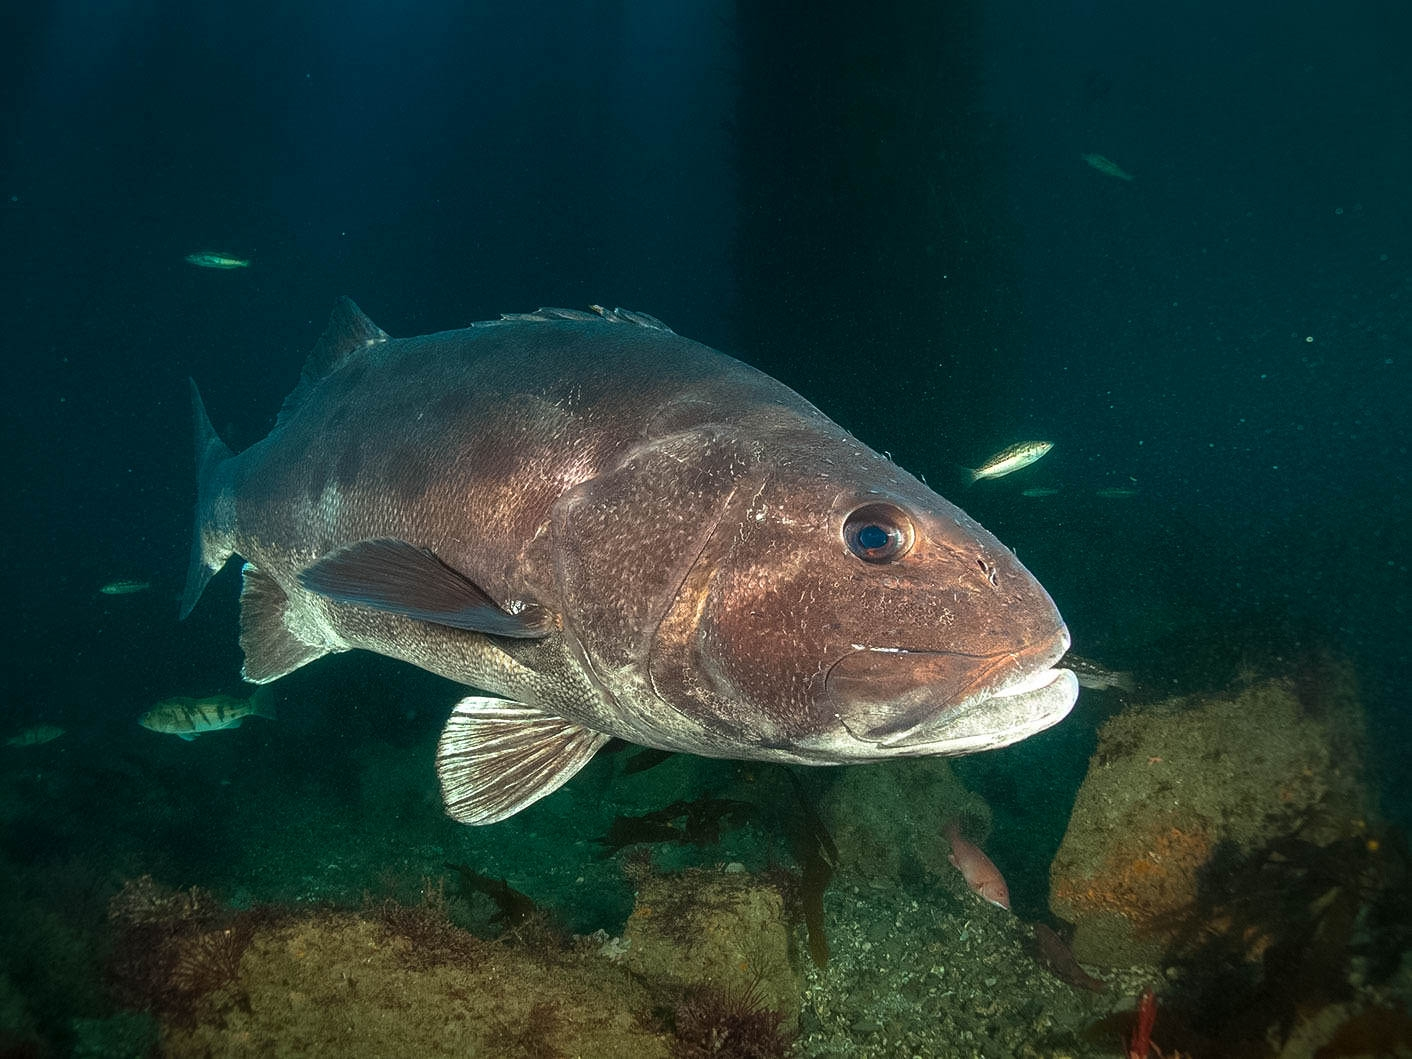 Giant Bass